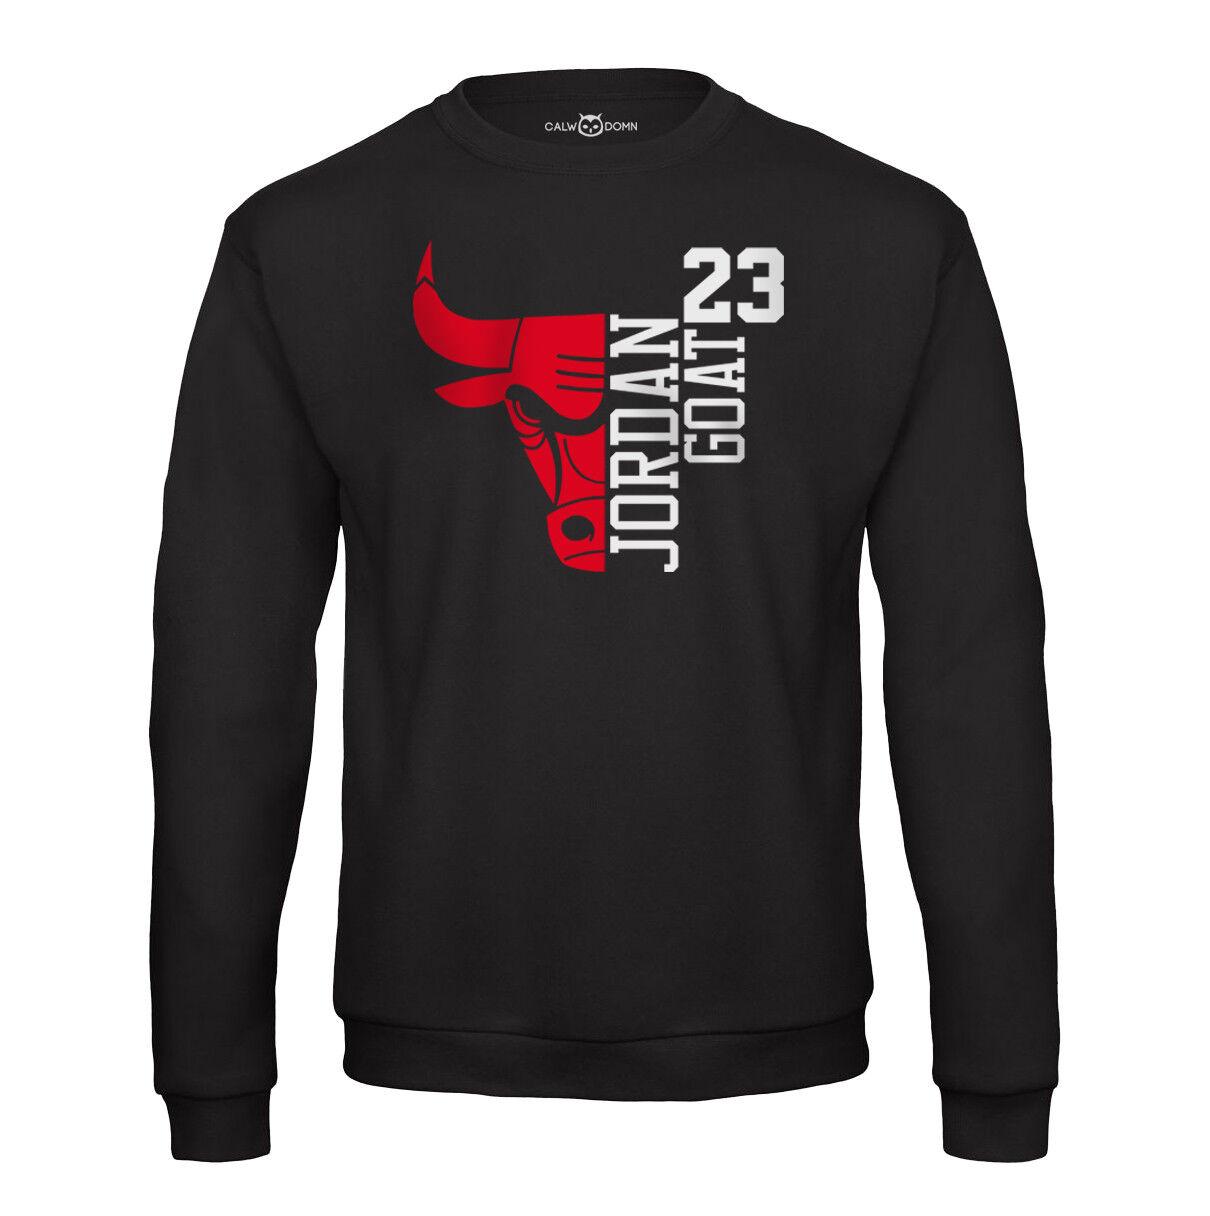 Jordan Sweat Shirt 23 GOAT Chicago Herren Pullover Bulls Michael Basketball